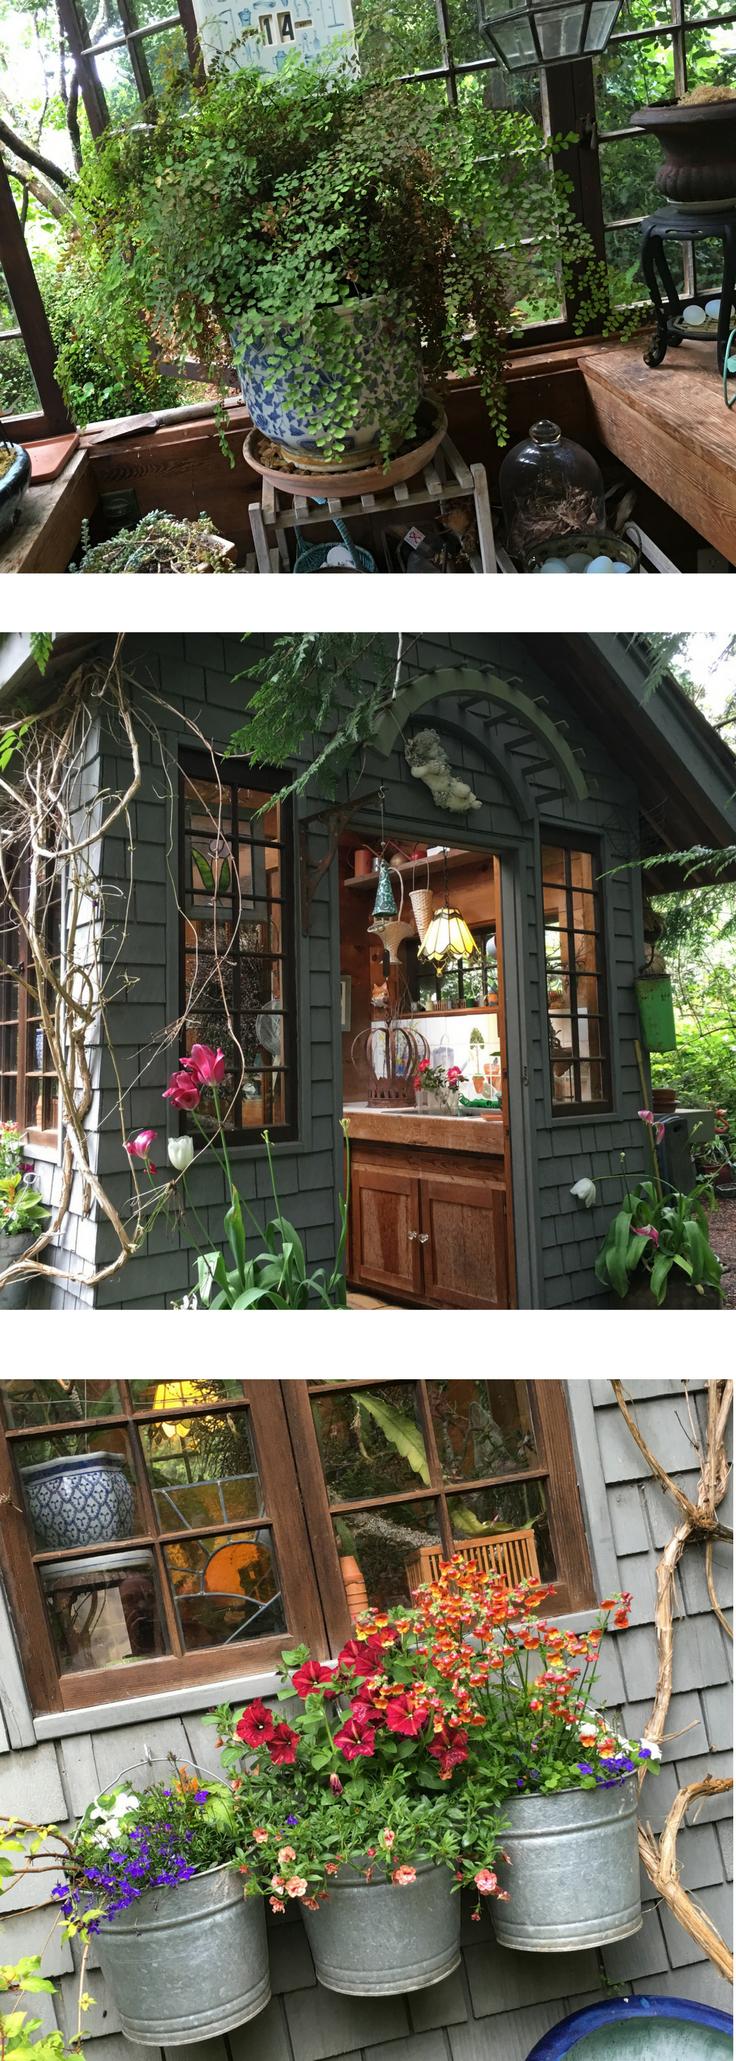 Gorgeous Rustic Garden Potting Shed - Take A Tour